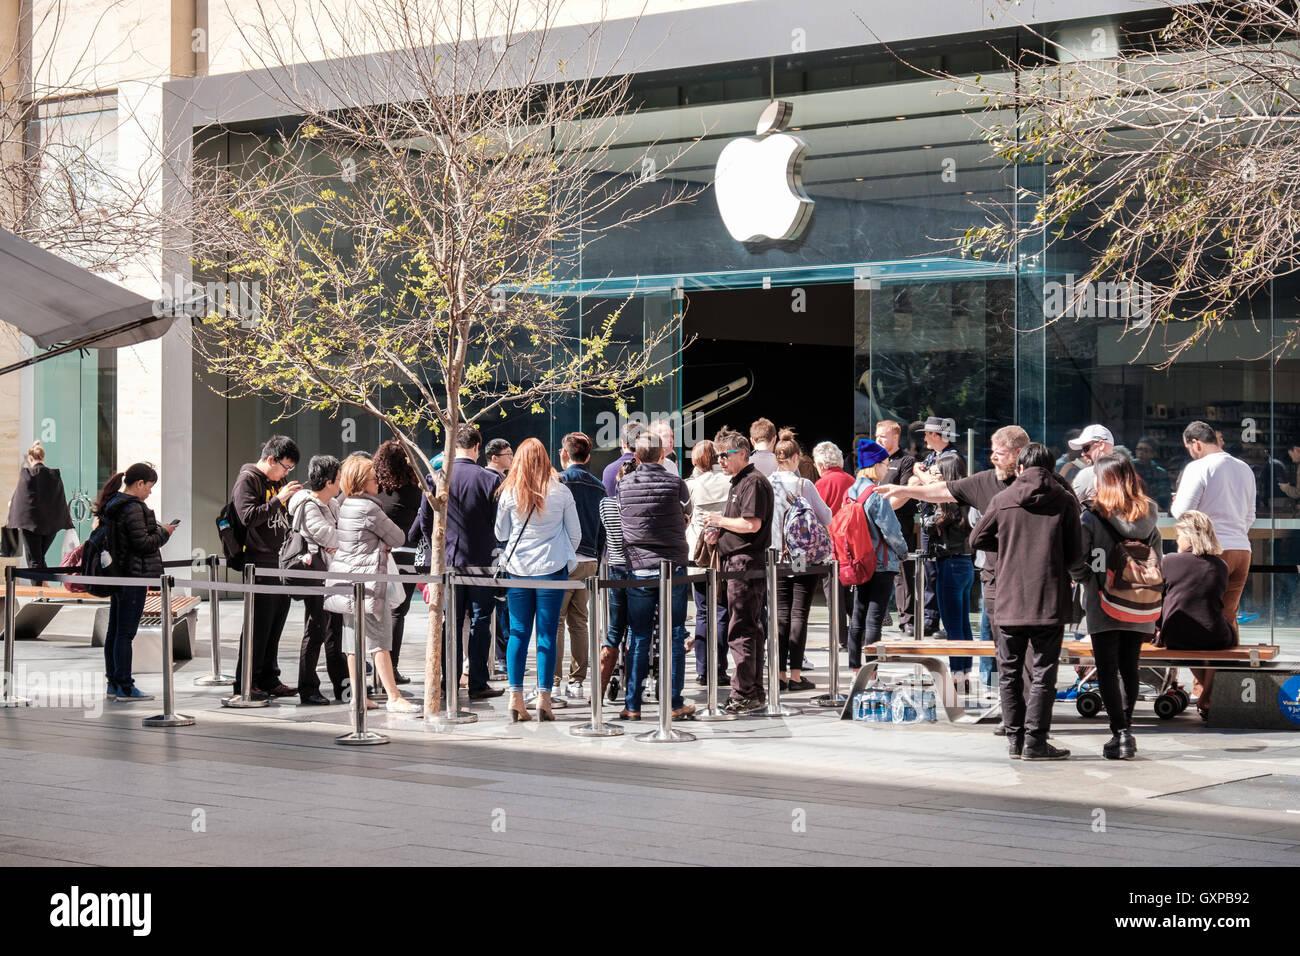 Apple Store Line Stock Photos & Apple Store Line Stock ...